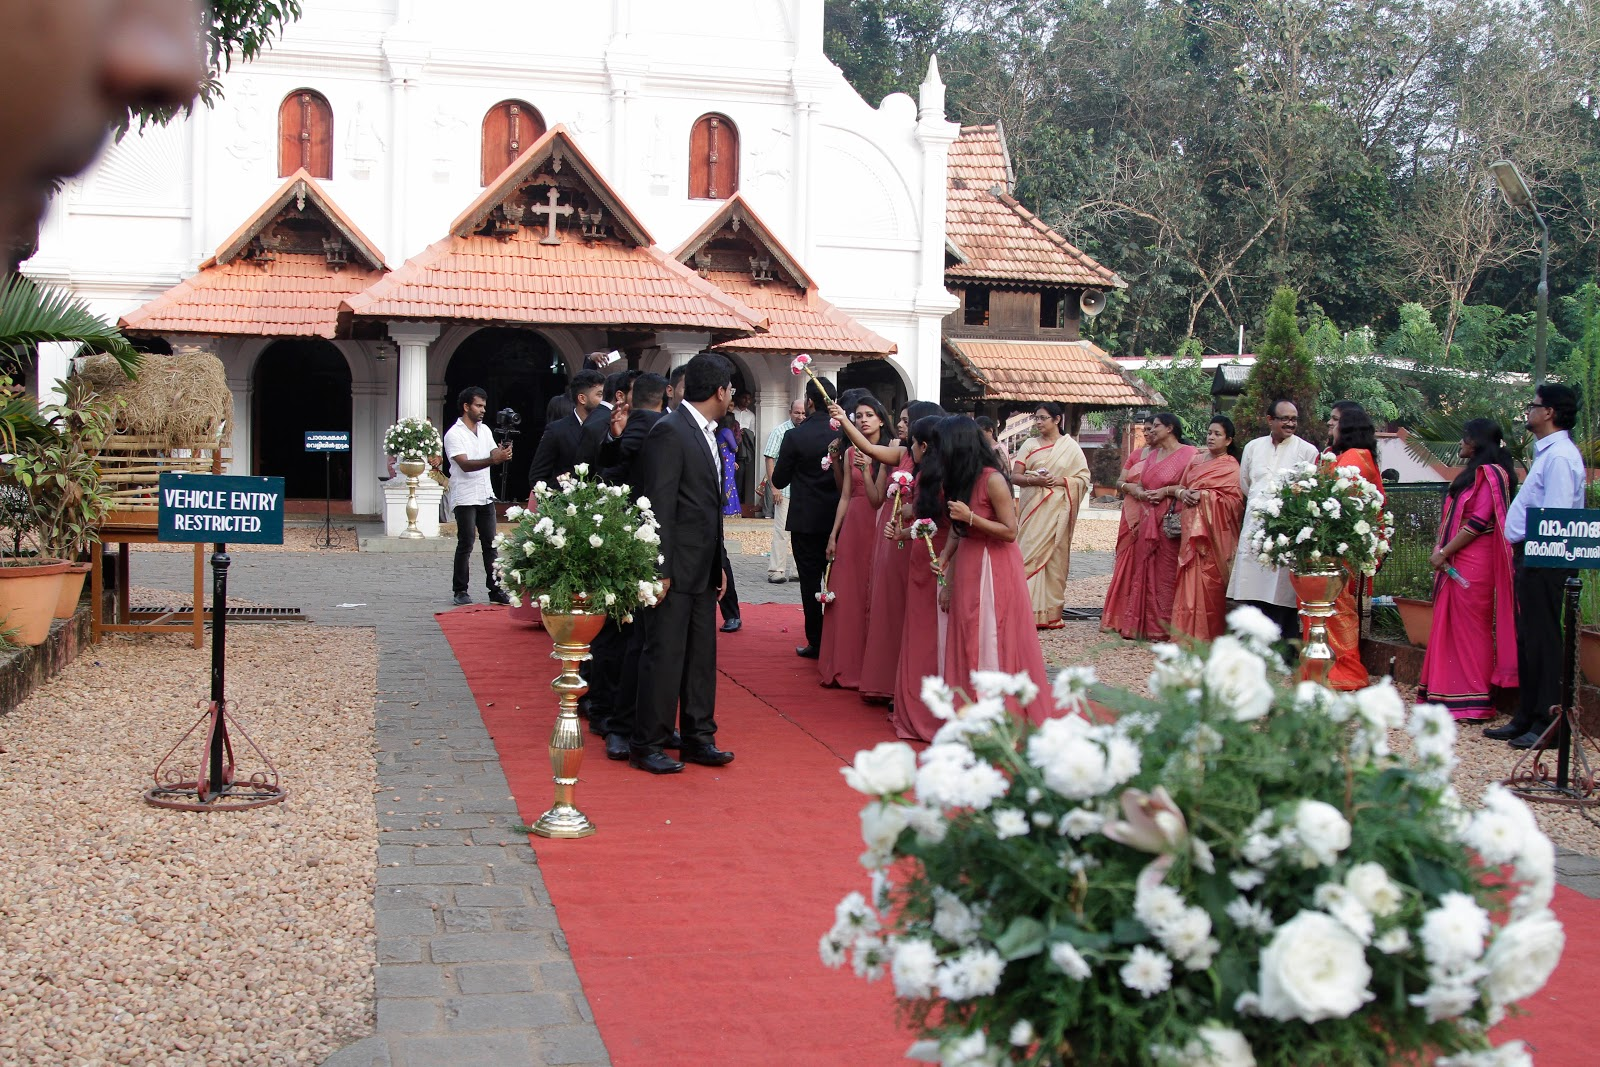 wedding planner pathanamthitta +k,  wedding planner pathanamthitta + l,  wedding planner pathanamthitta + m,  wedding planner pathanamthitta + n,  wedding planner pathanamthitta + o